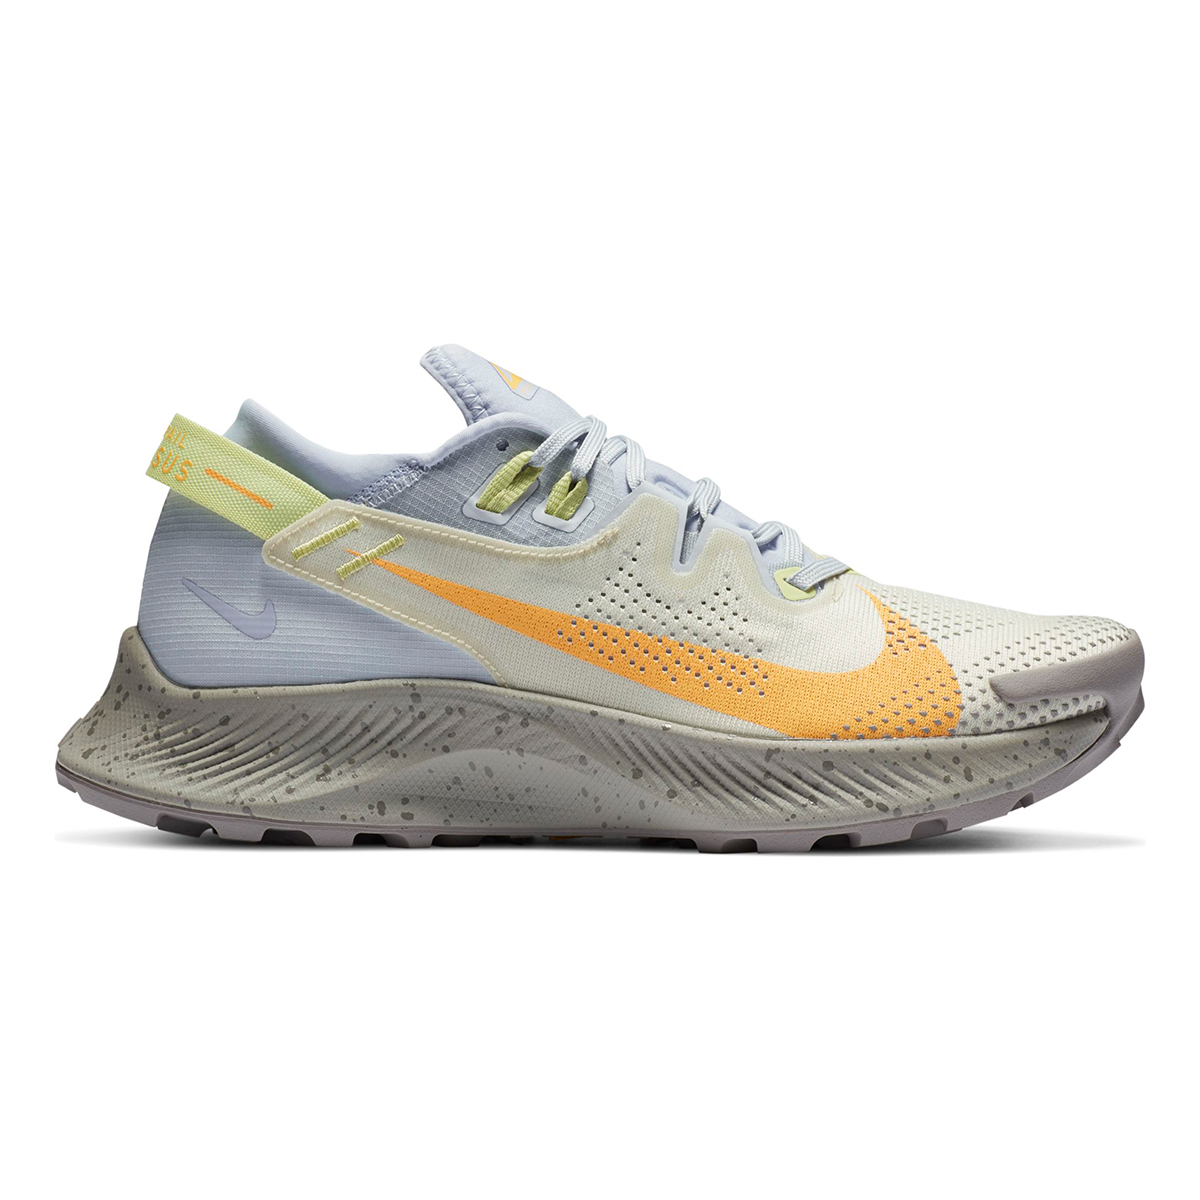 Women's Nike Pegasus Trail 2 Trail Running Shoe - Color: Pure Platinum/Fossil/Limelight/Laser Orange - Size: 5 - Width: Regular, Pure Platinum/Fossil/Limelight/Laser Orange, large, image 1